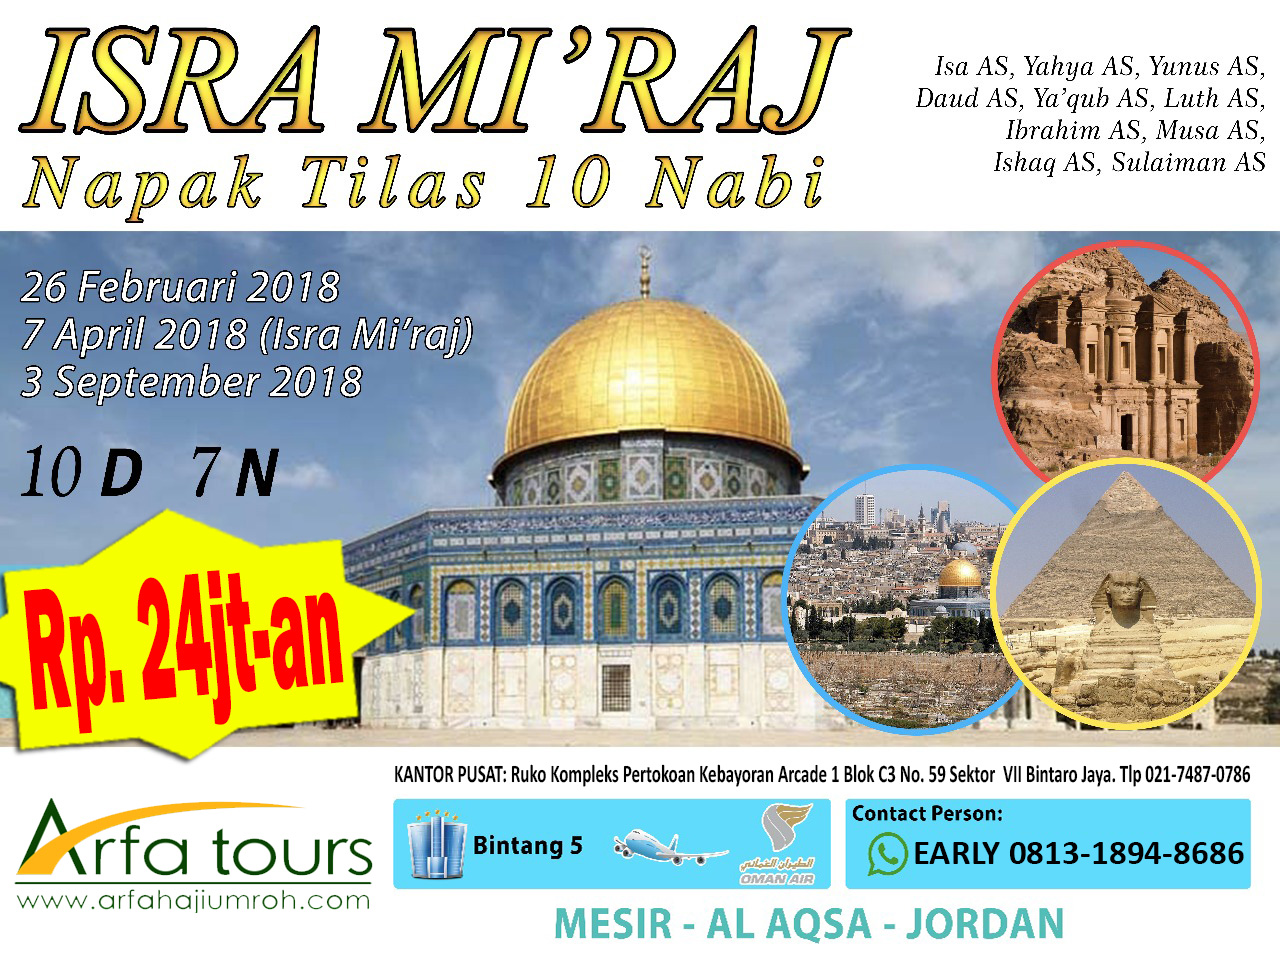 Paket tur napak tilas 10 nabi jerusalem-jordan-cairo arfa tours